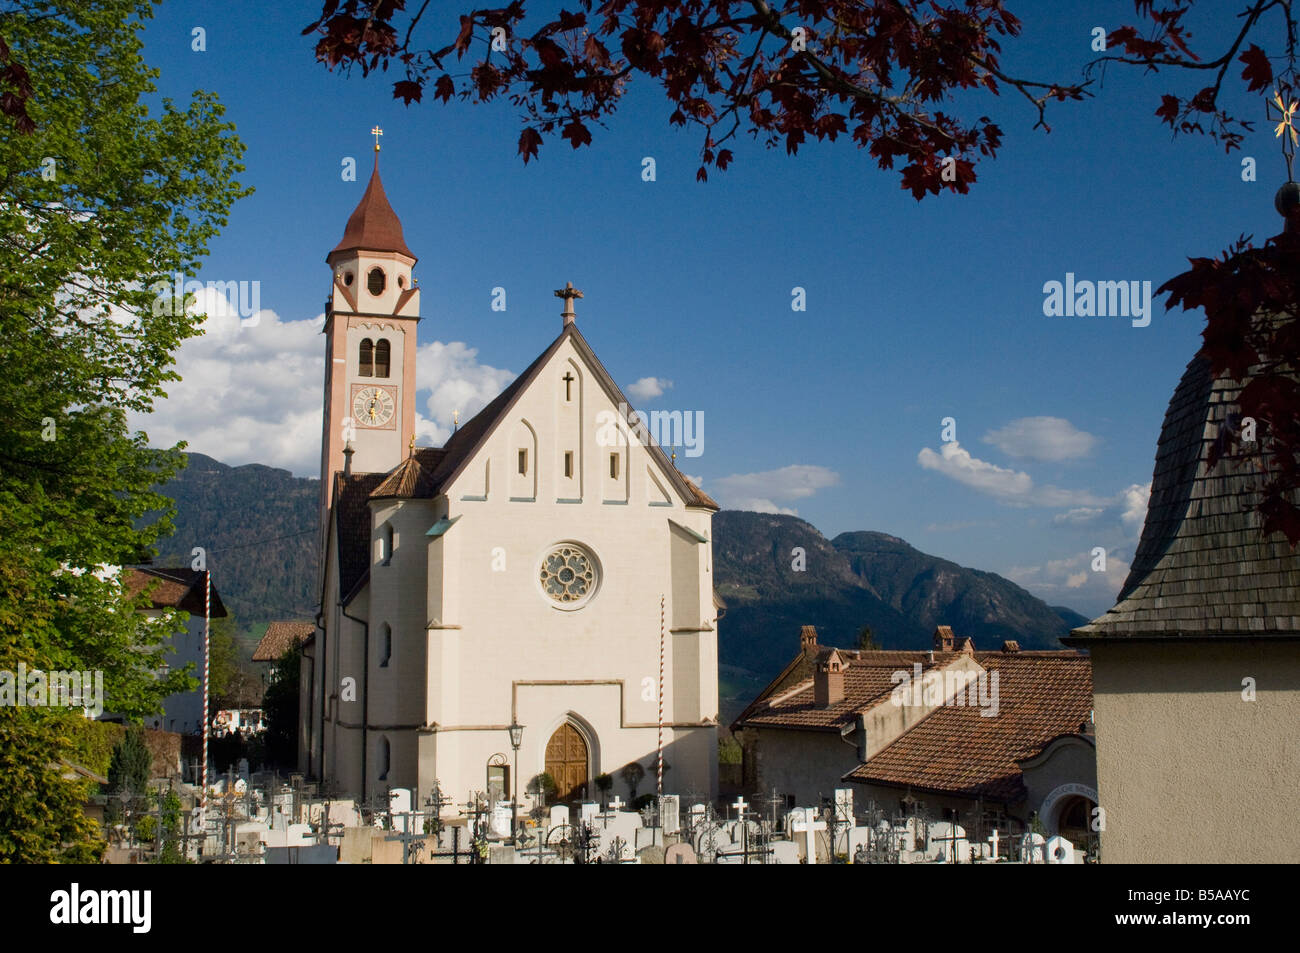 Church of St. John the Baptist, Dorf Tyrol, Sud Tyrol, Italy, Europe - Stock Image